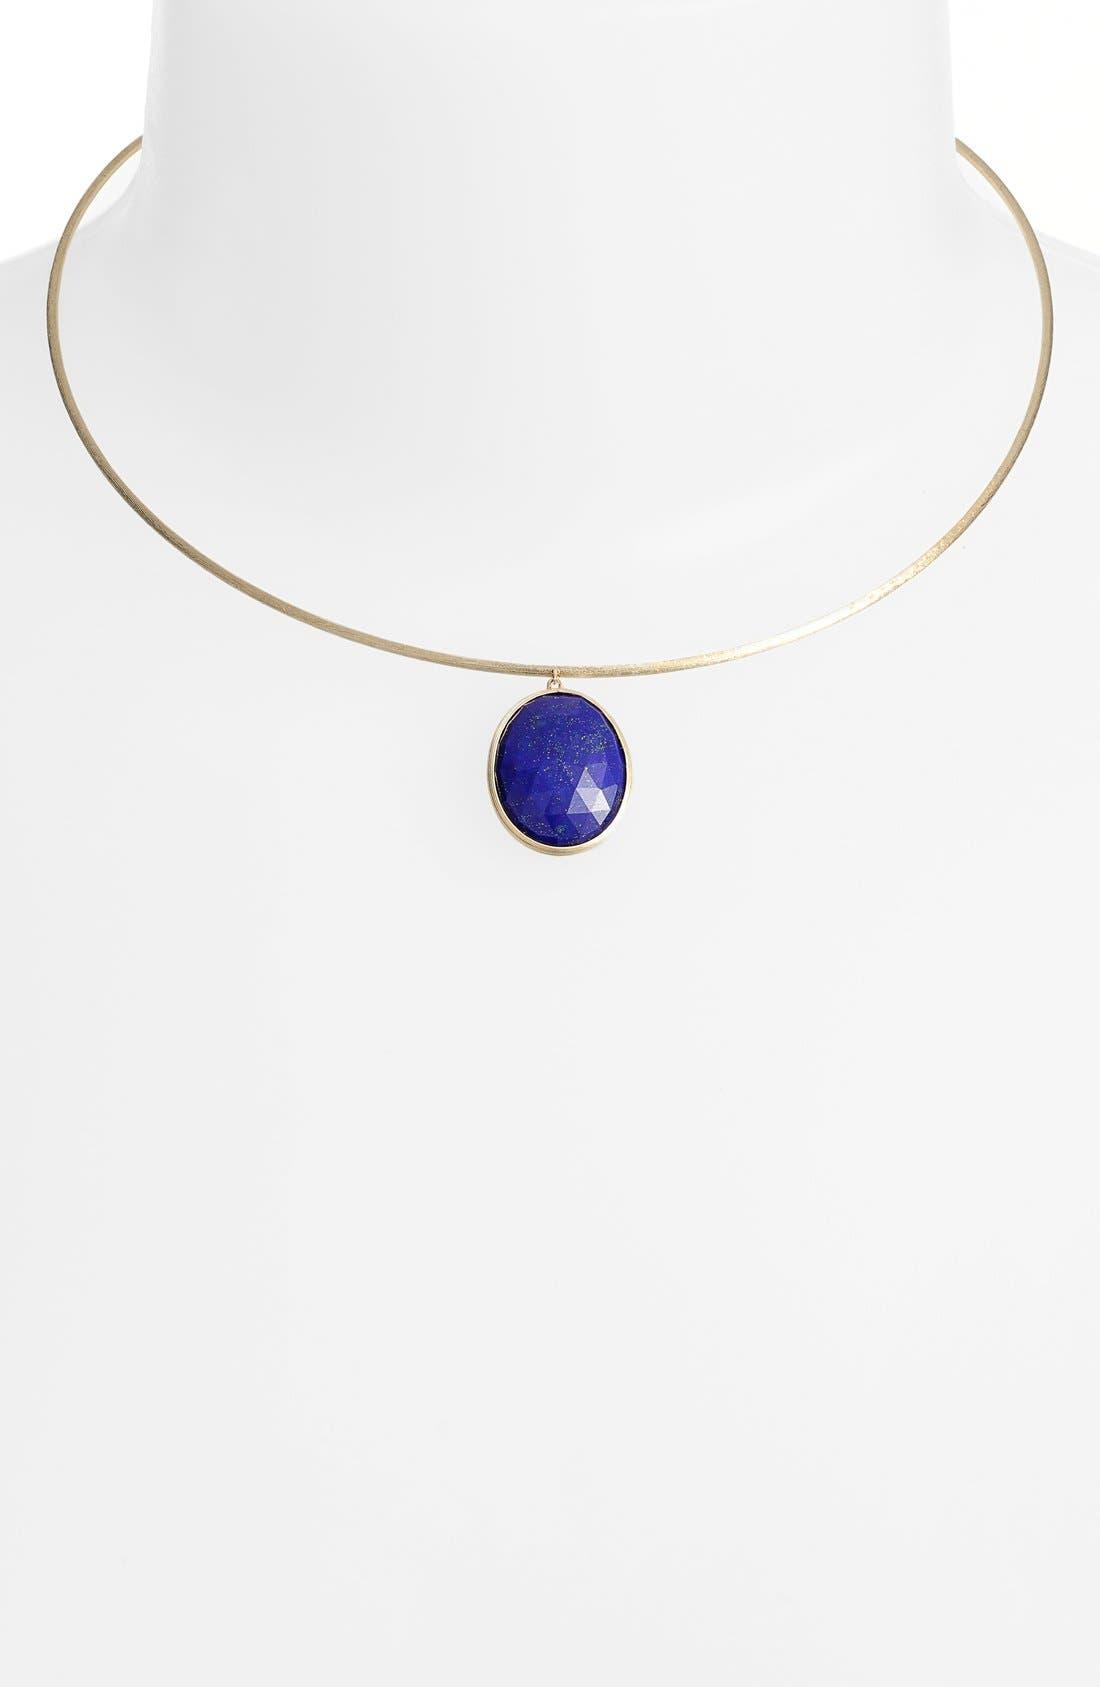 'Lunaria' Lapis Collar Necklace,                             Alternate thumbnail 2, color,                             Yellow Gold/ Lapis